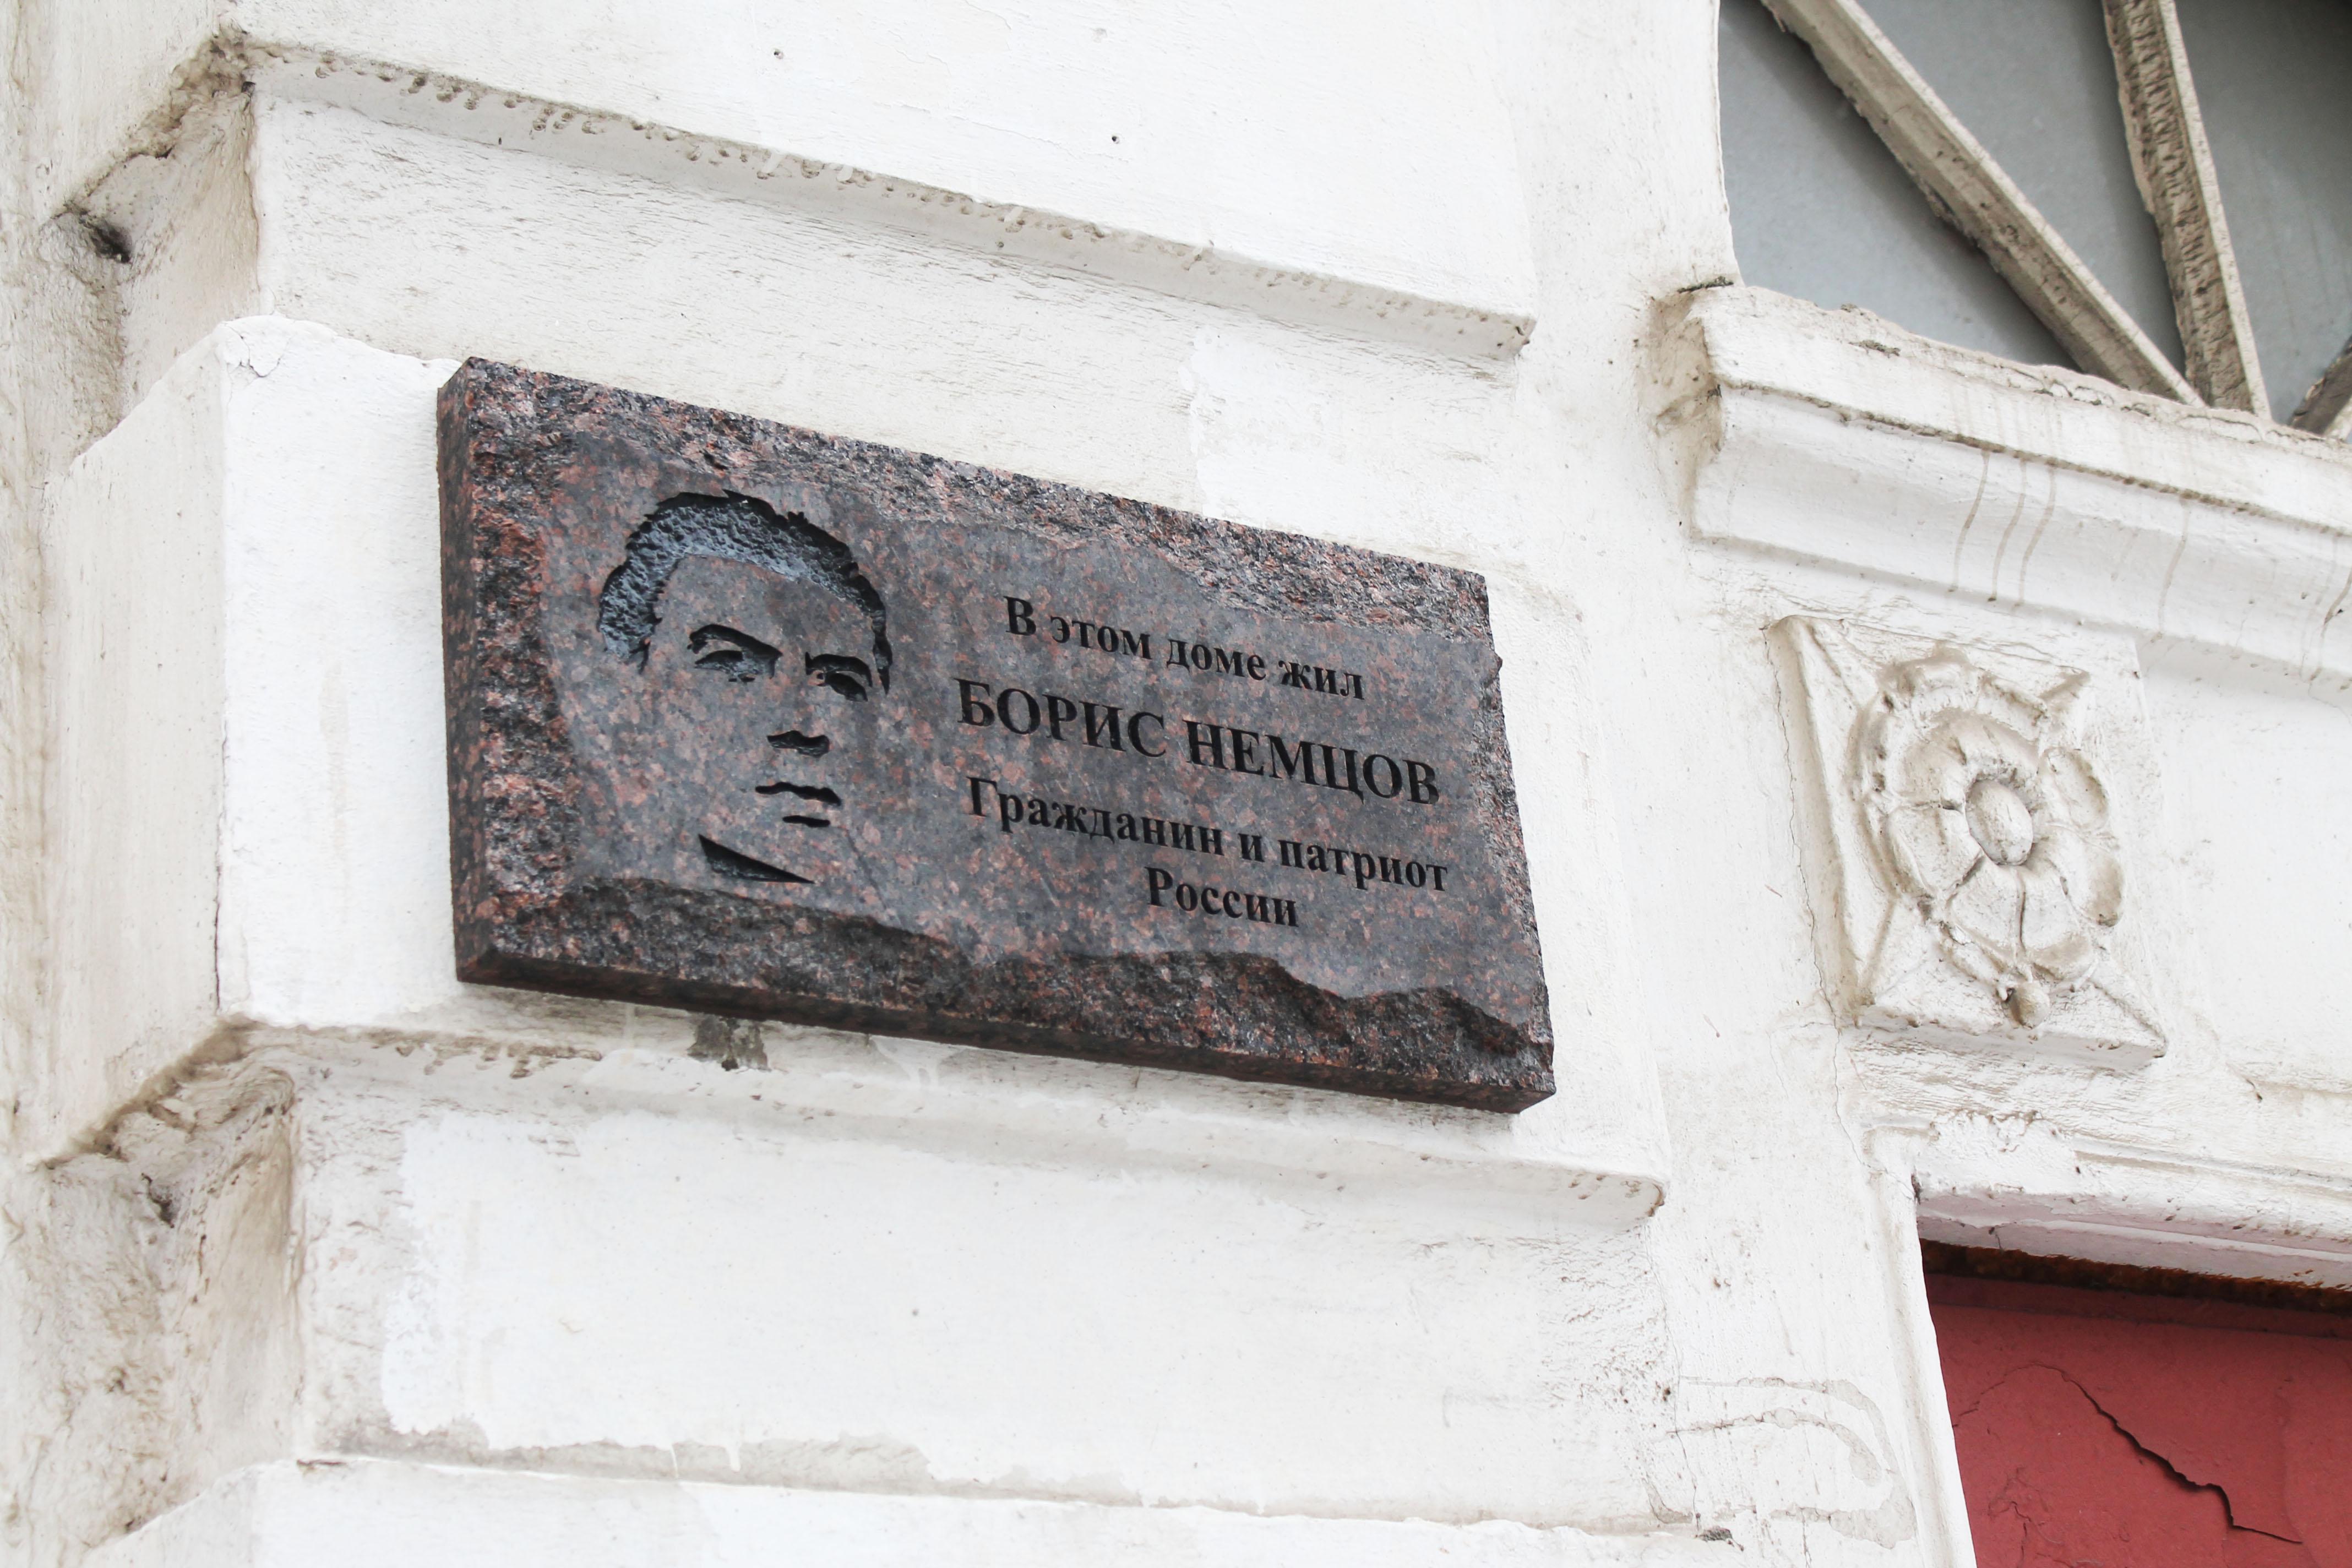 Мемориальная доска Б. Е. Немцову